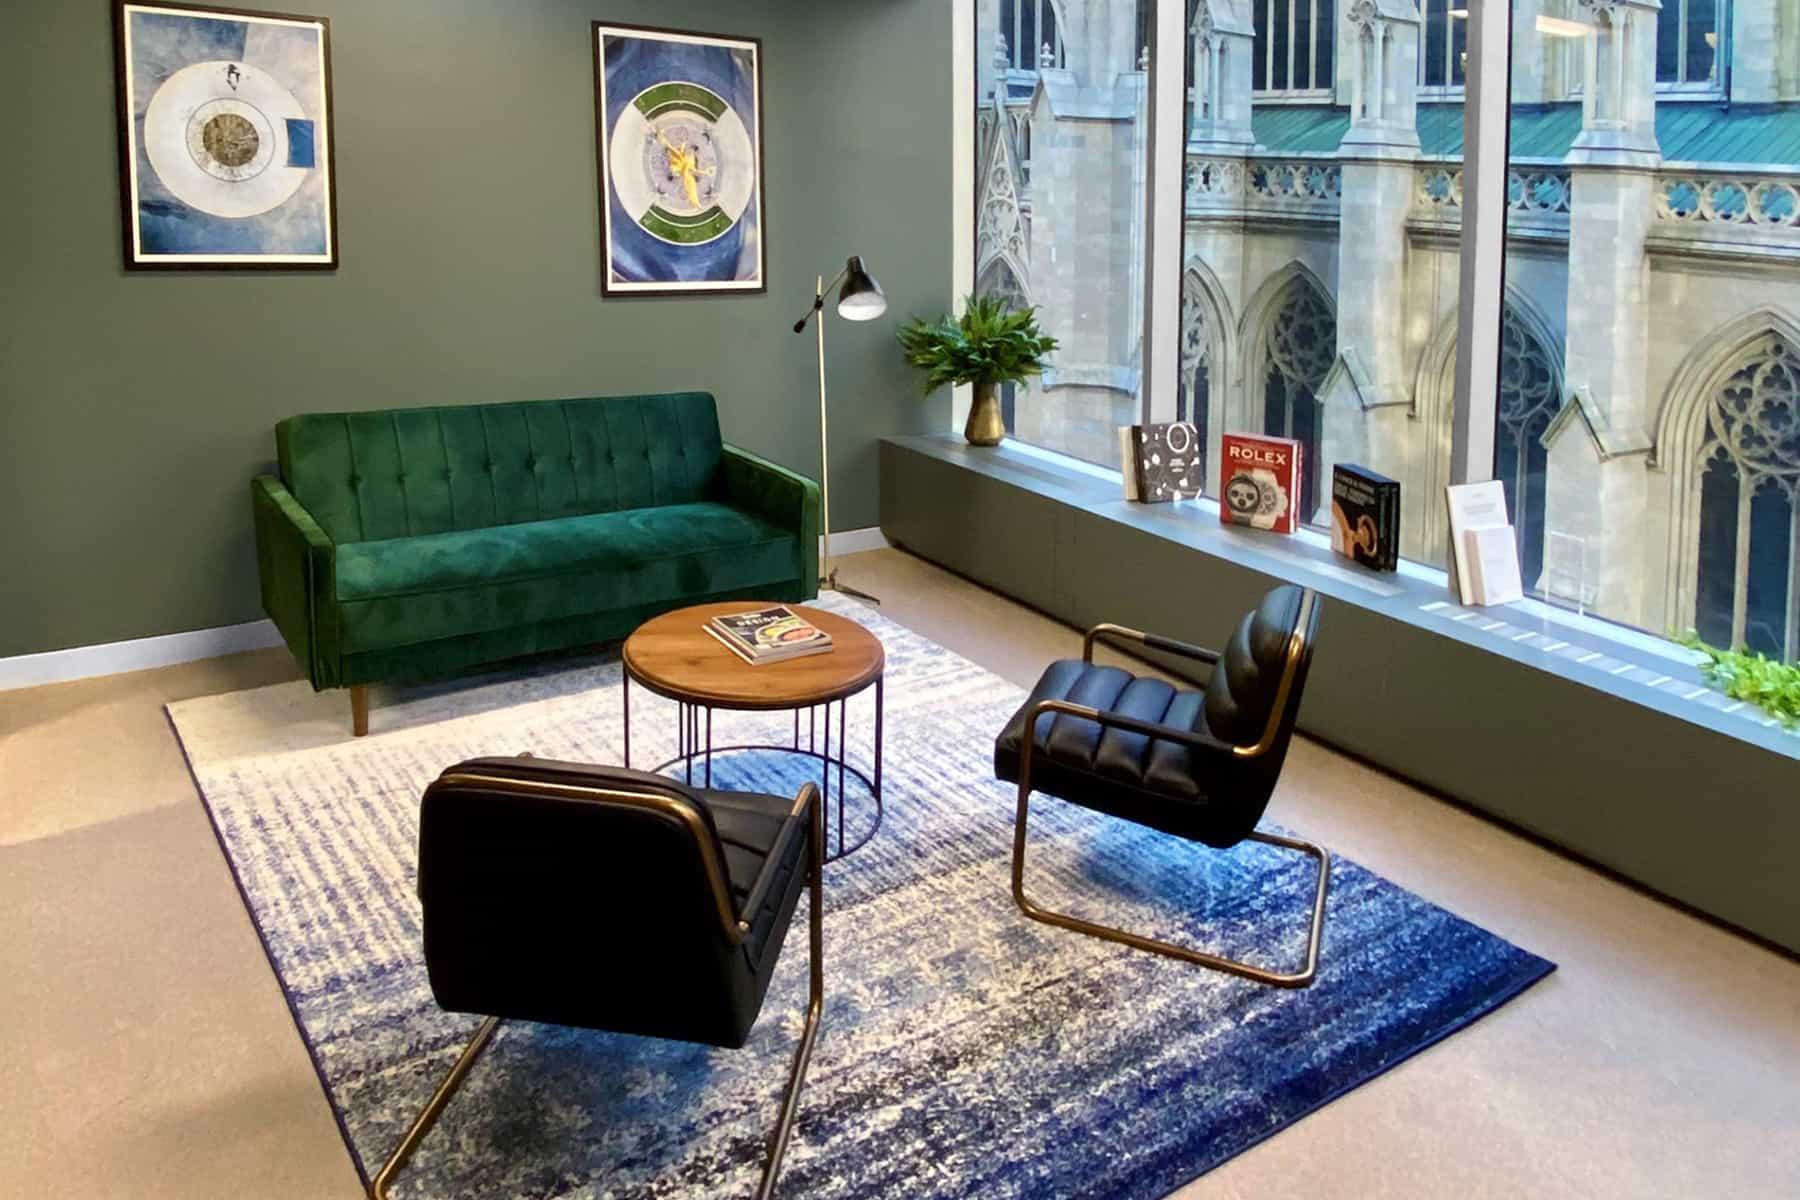 Watchfinder & Co. New York Showroom interior 2